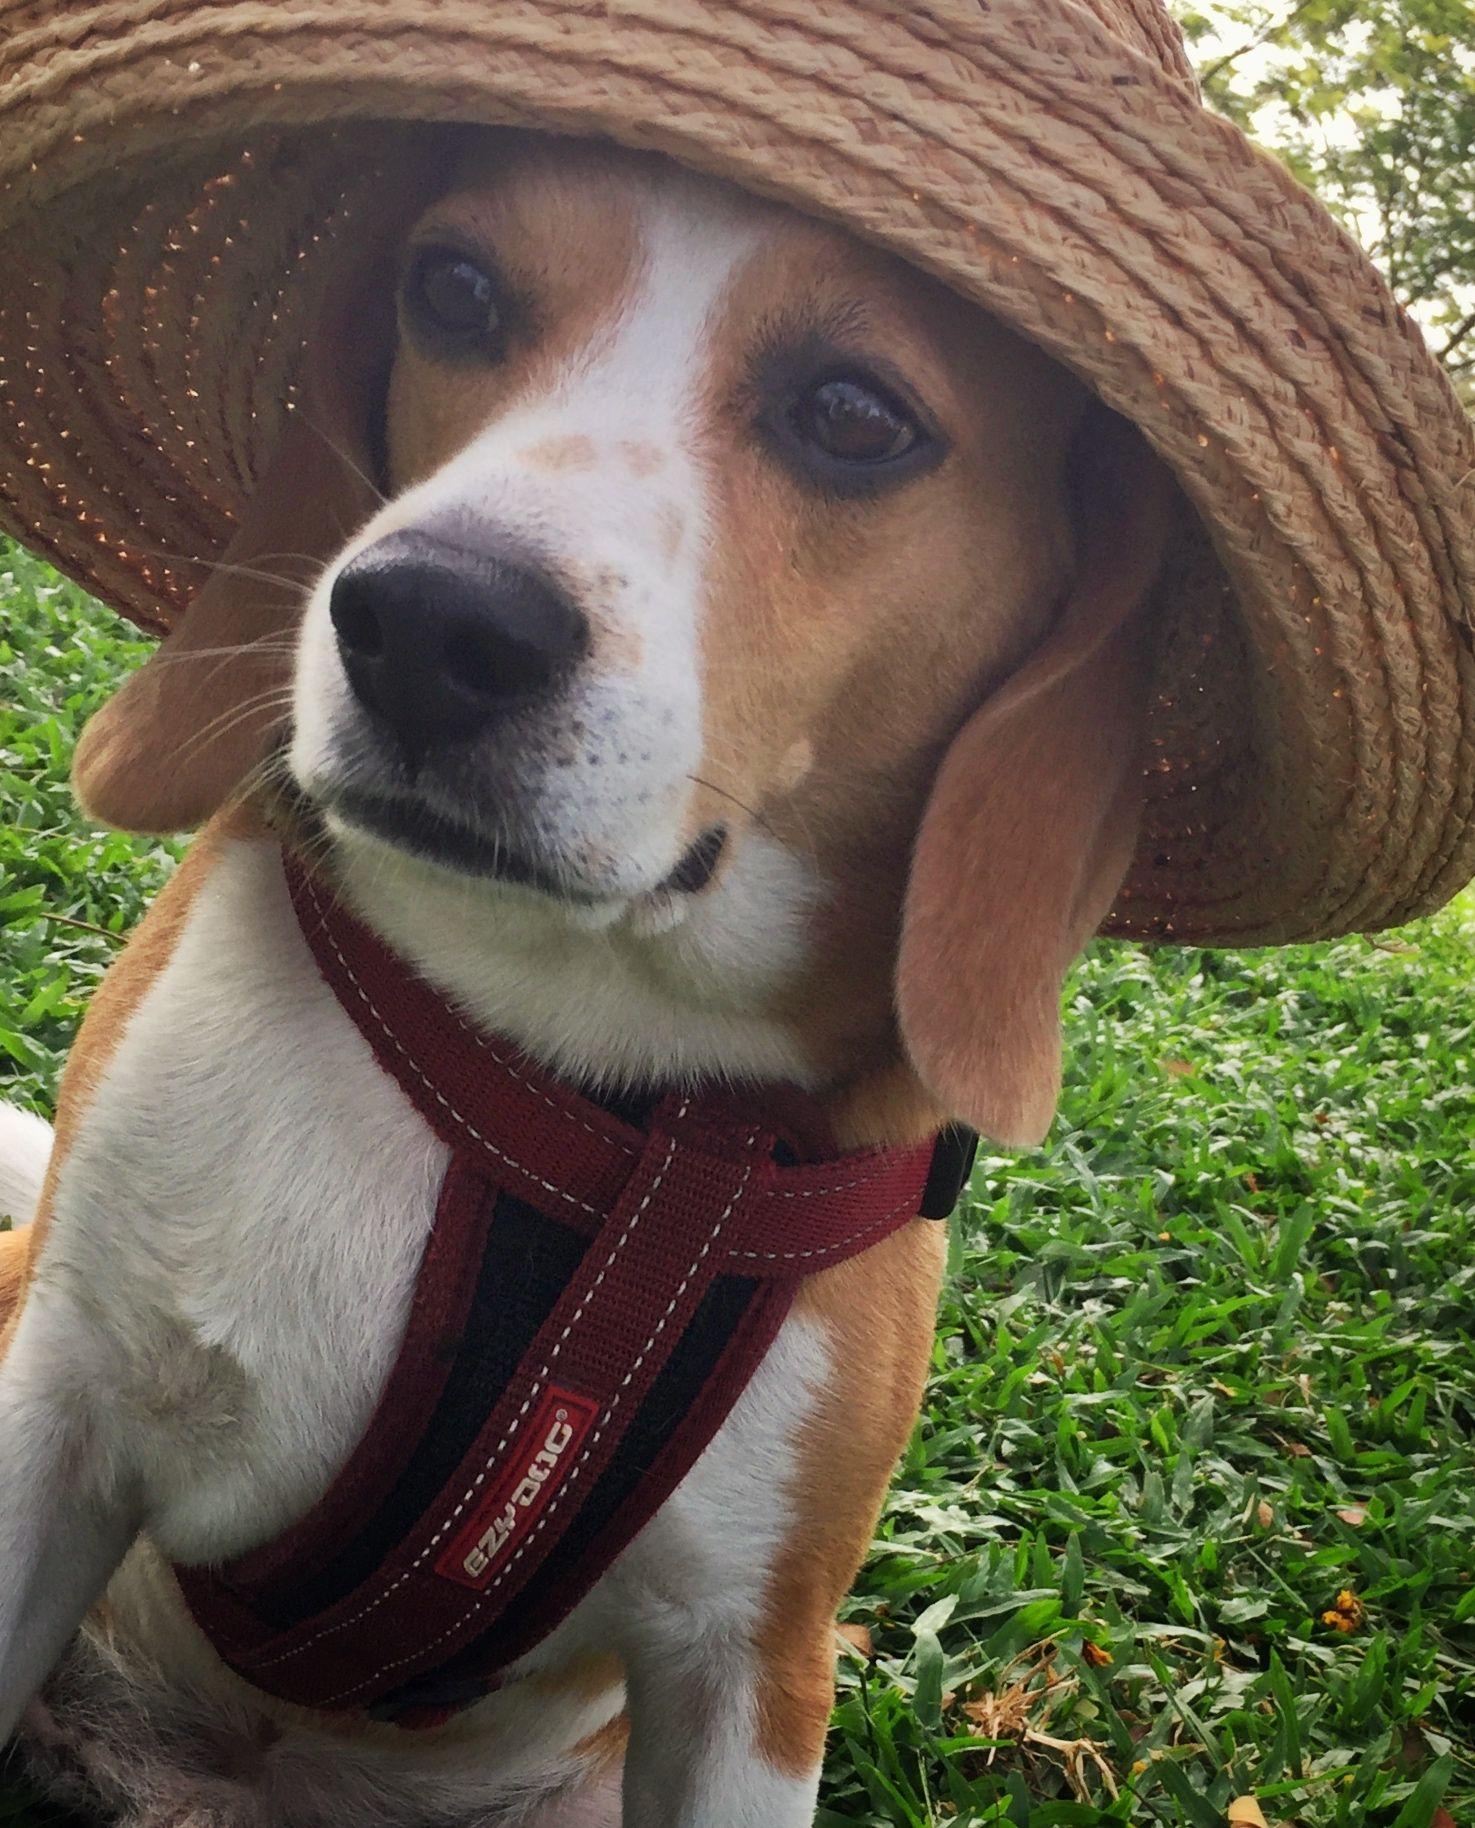 Amazing Beagle Chubby Adorable Dog - 716bc064226a3b0aa76055ef41eb1c80  Image_16946  .jpg